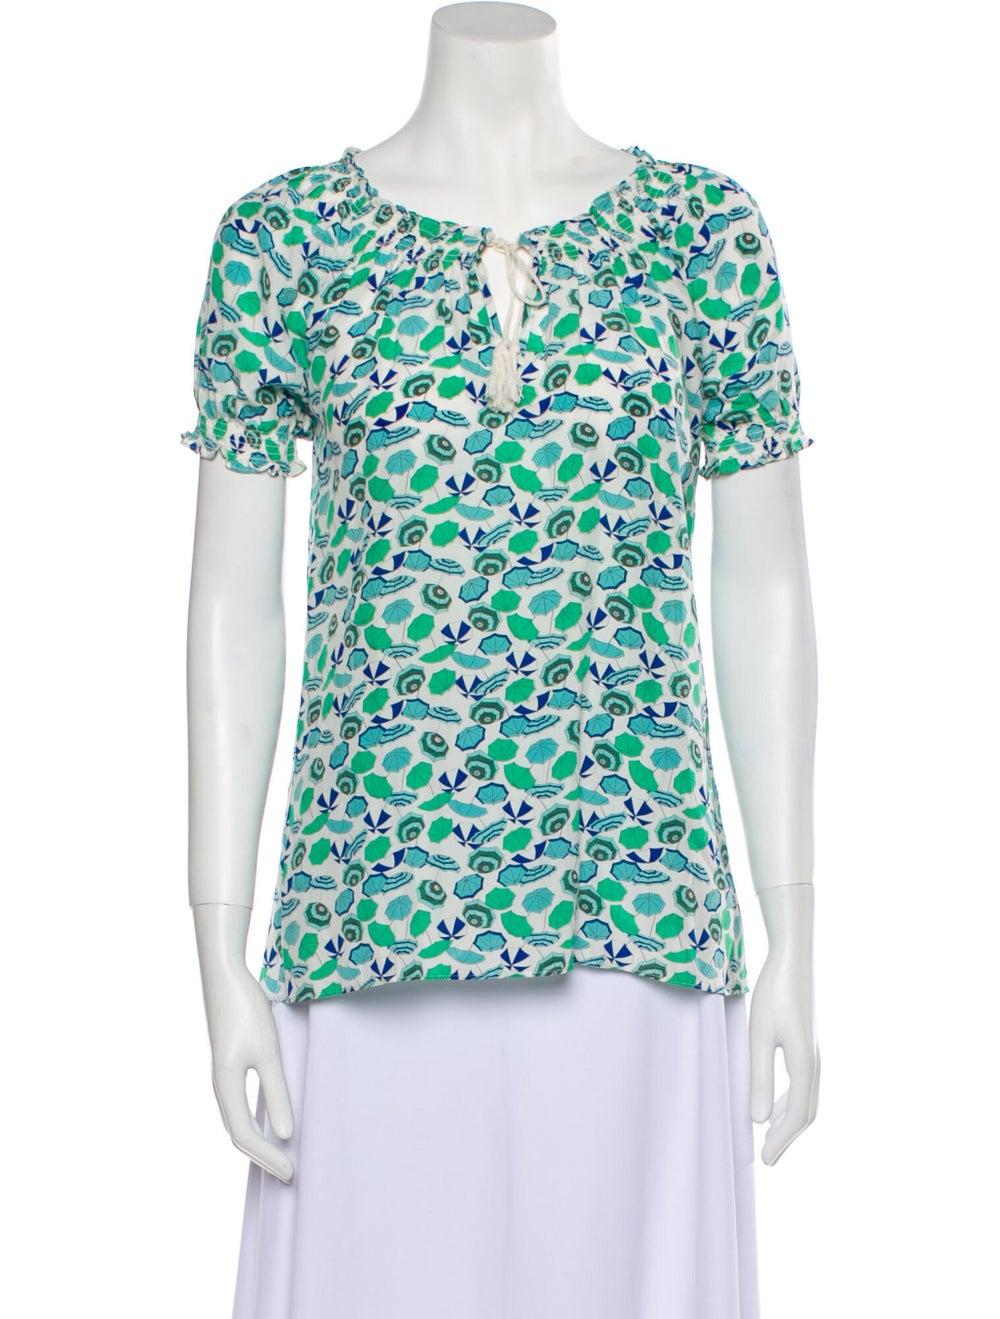 Joie modele Silk T-Shirt Green - image 1